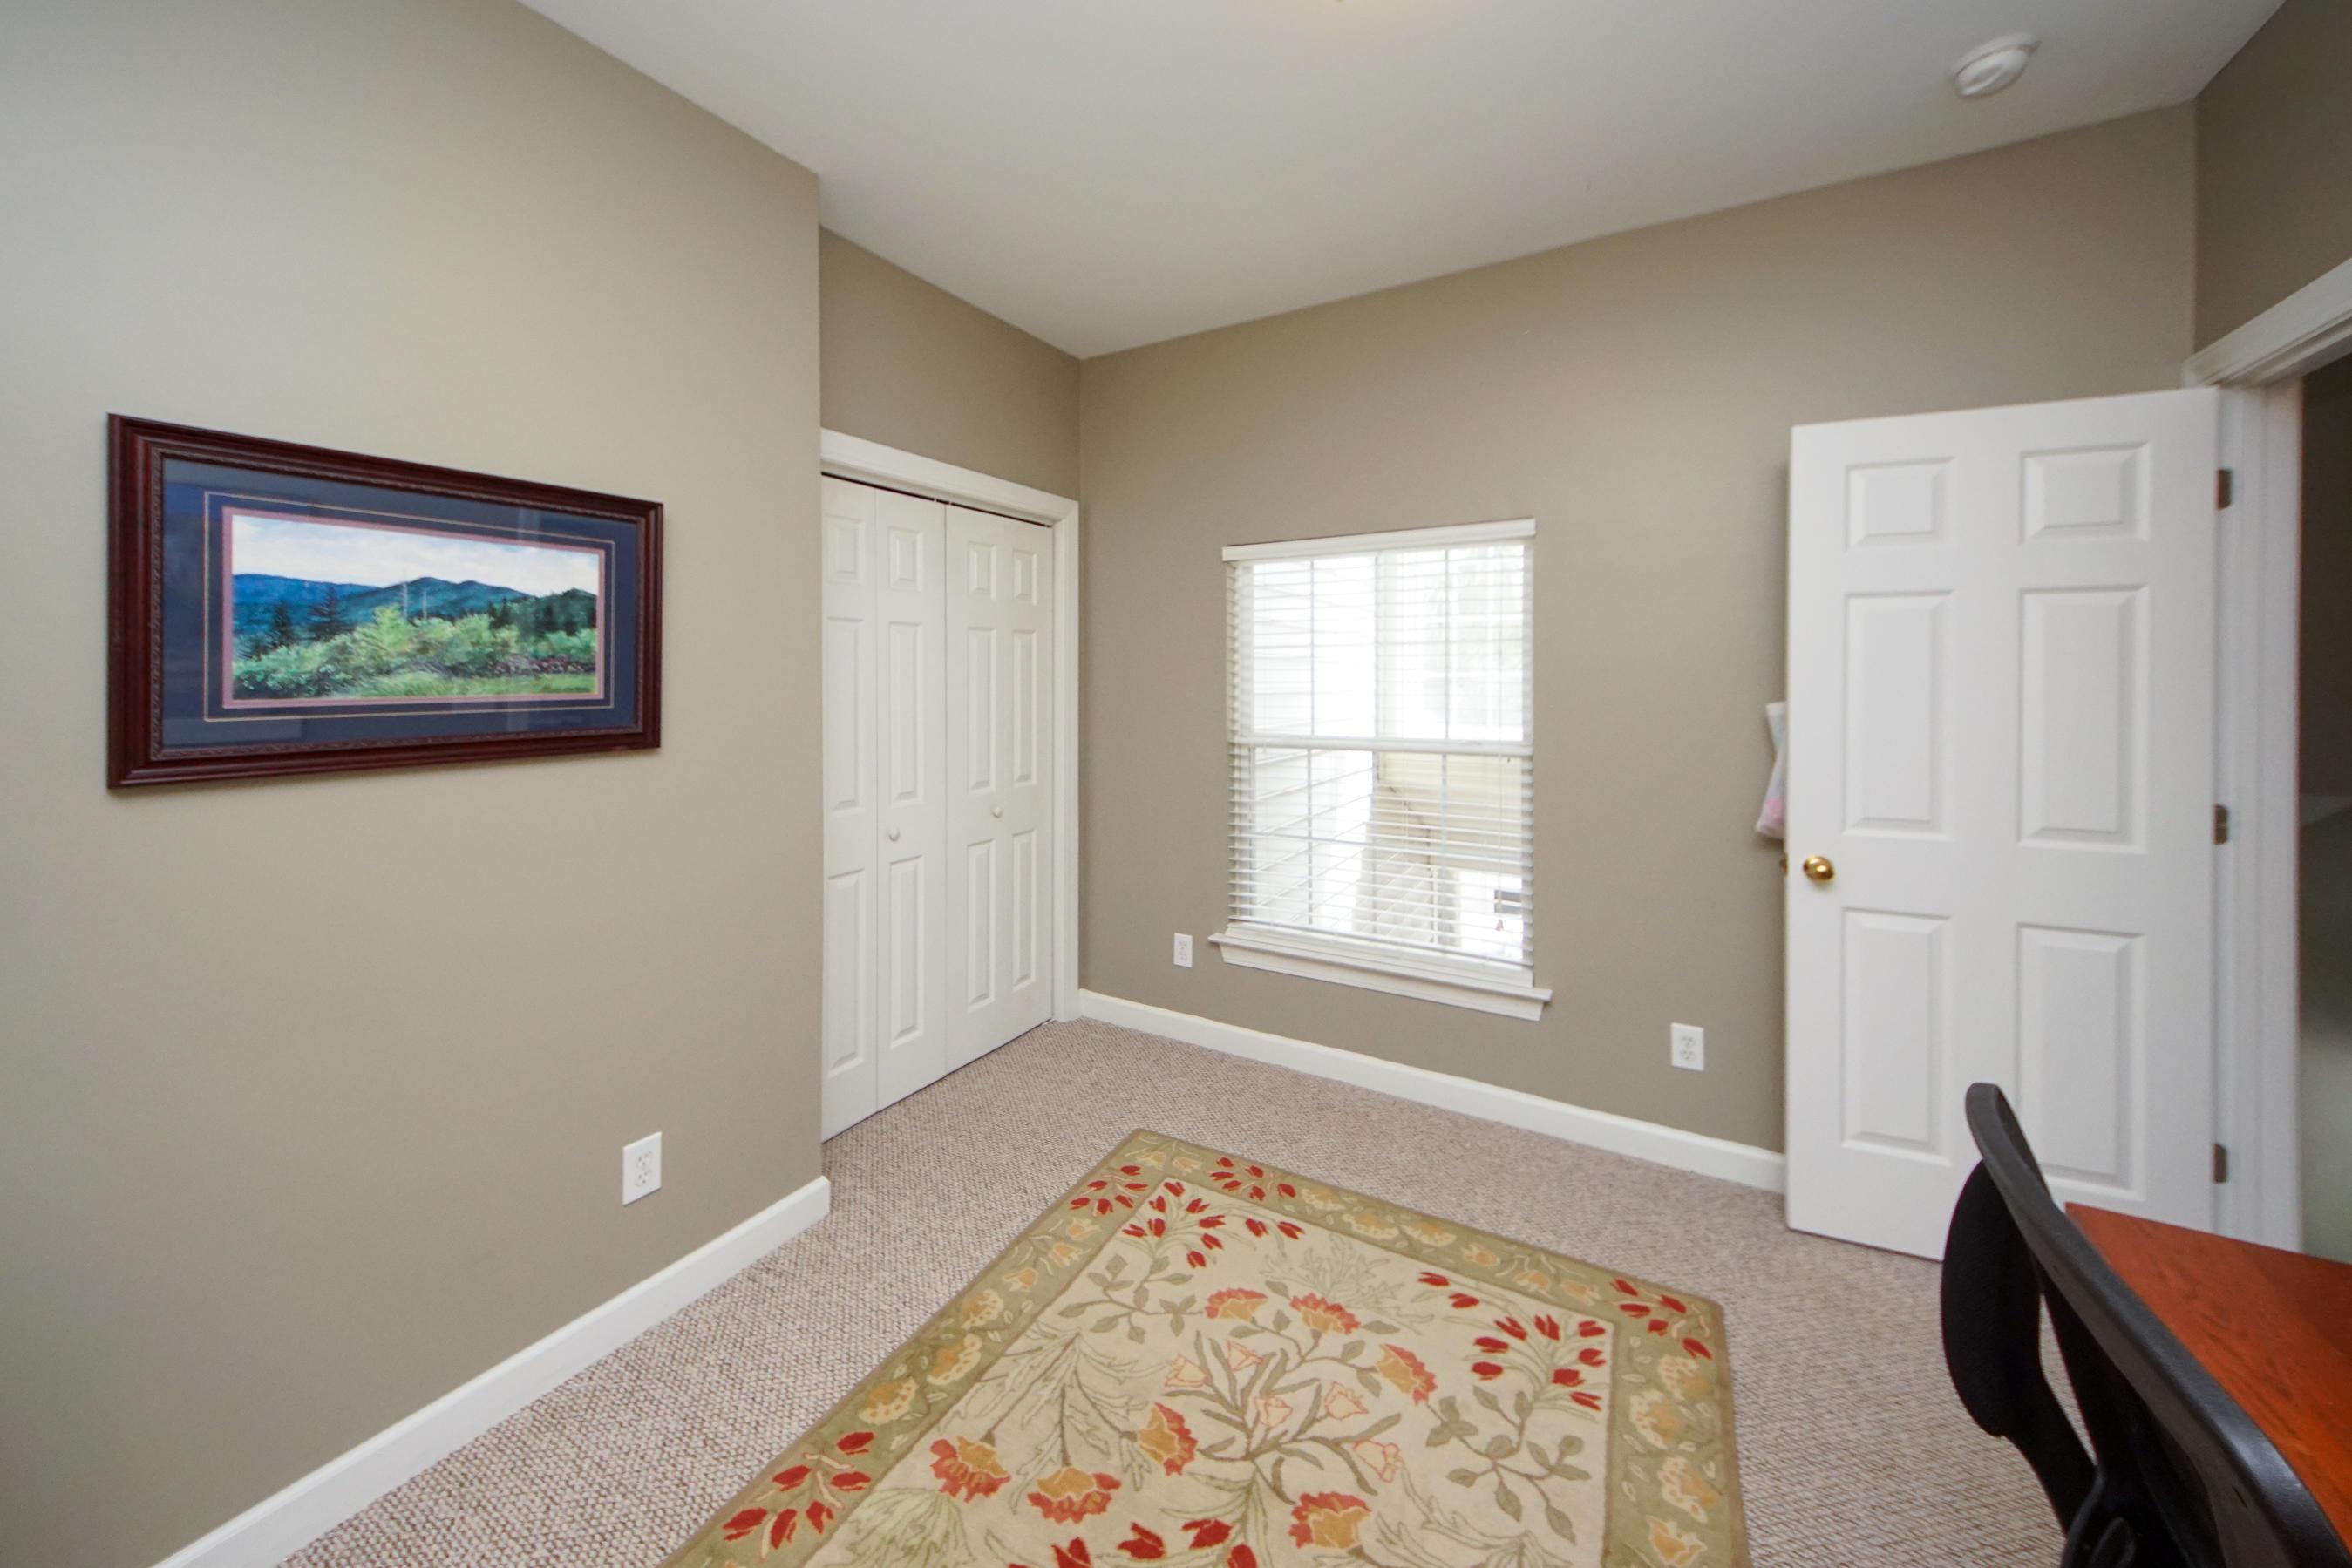 Dunes West Homes For Sale - 1631 Camfield, Mount Pleasant, SC - 28